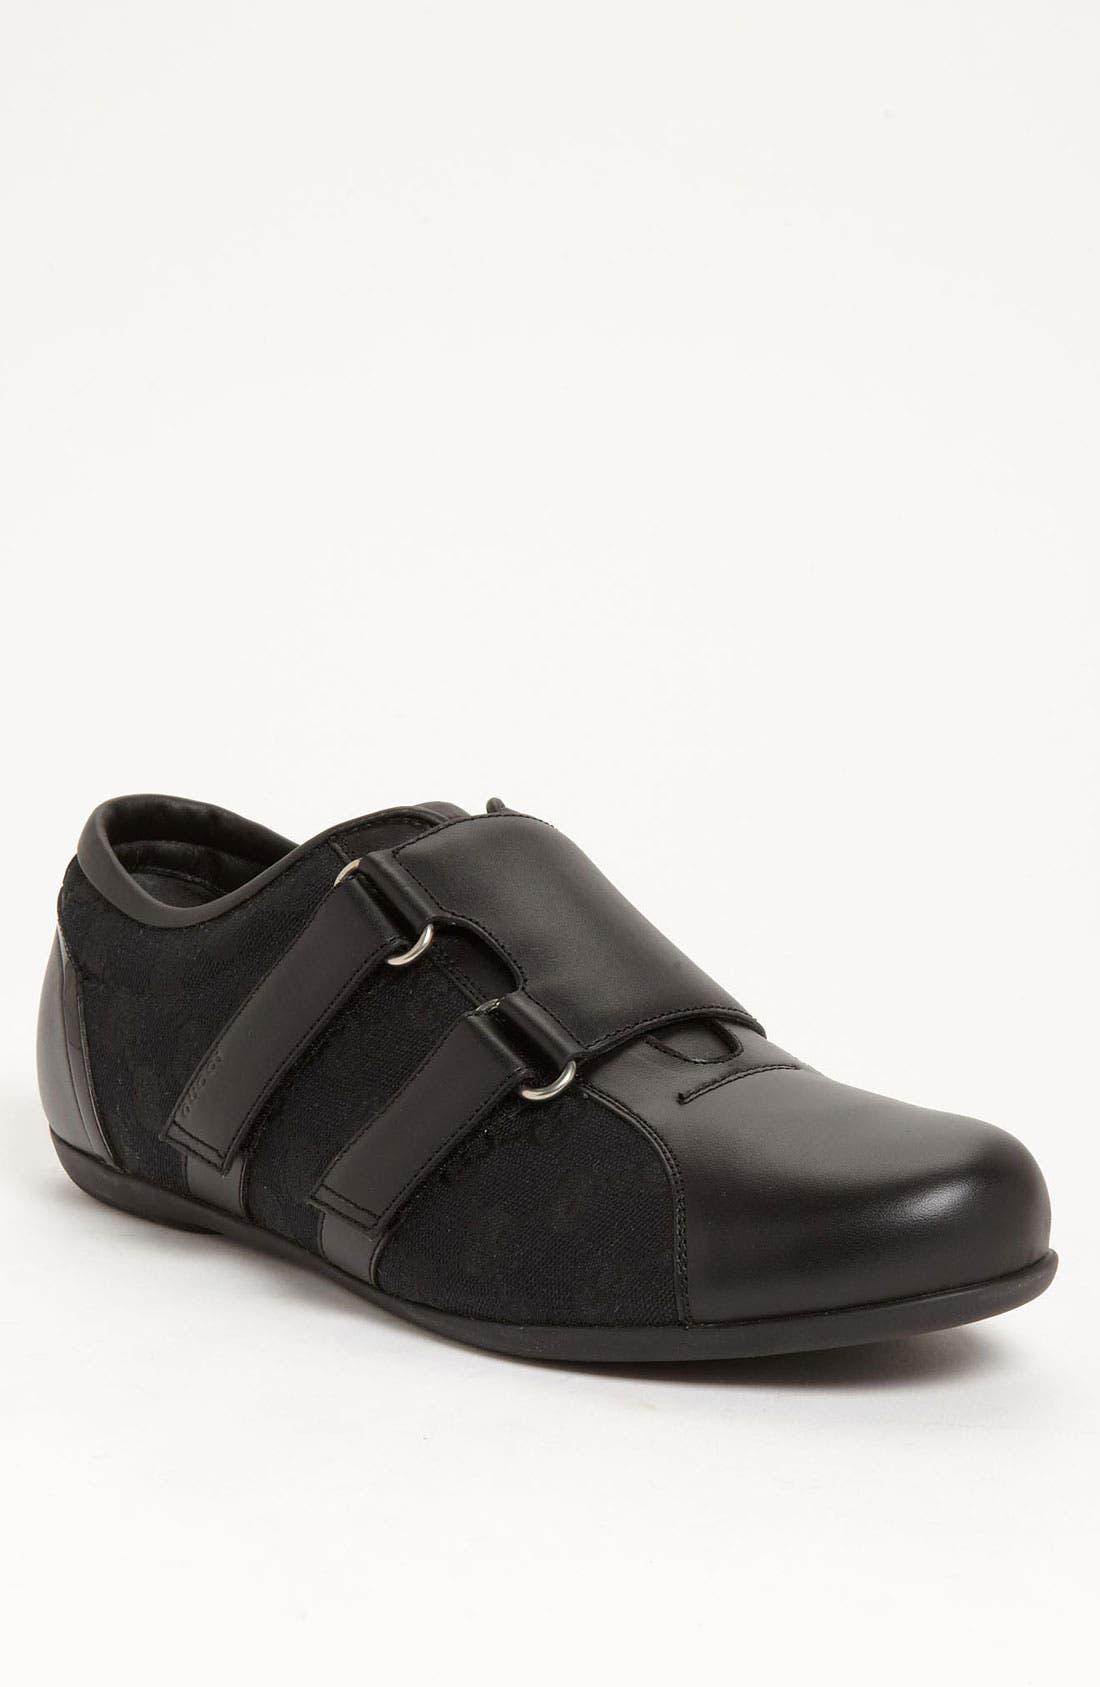 Main Image - Gucci 'Dragon' Double Monk Strap Sneaker